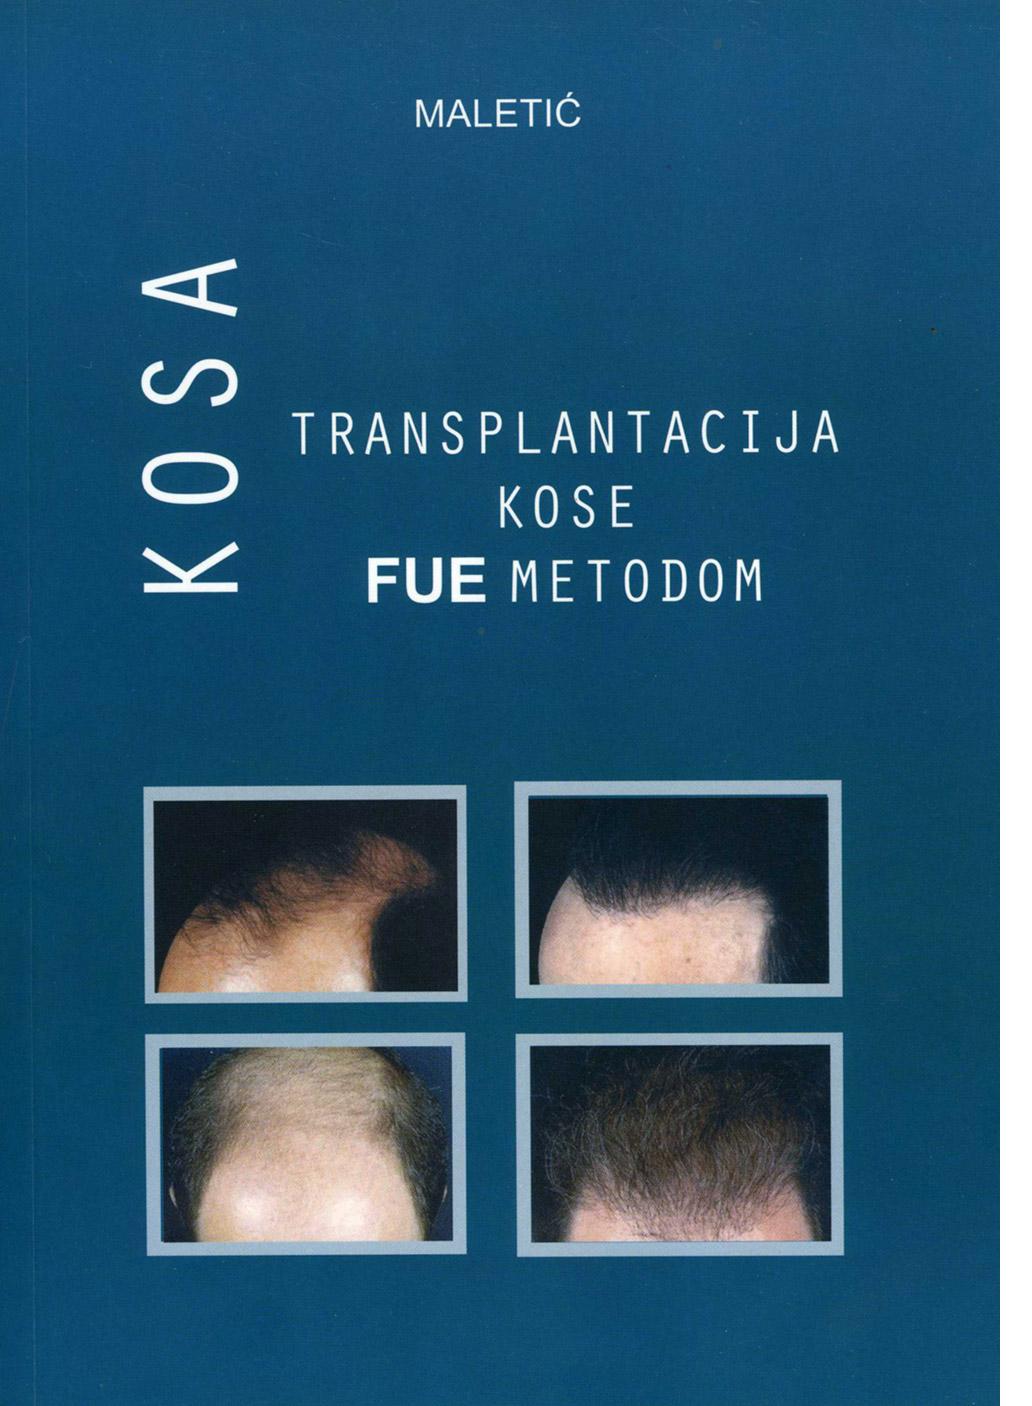 Transplantacija kose FUE metodom: Maletić